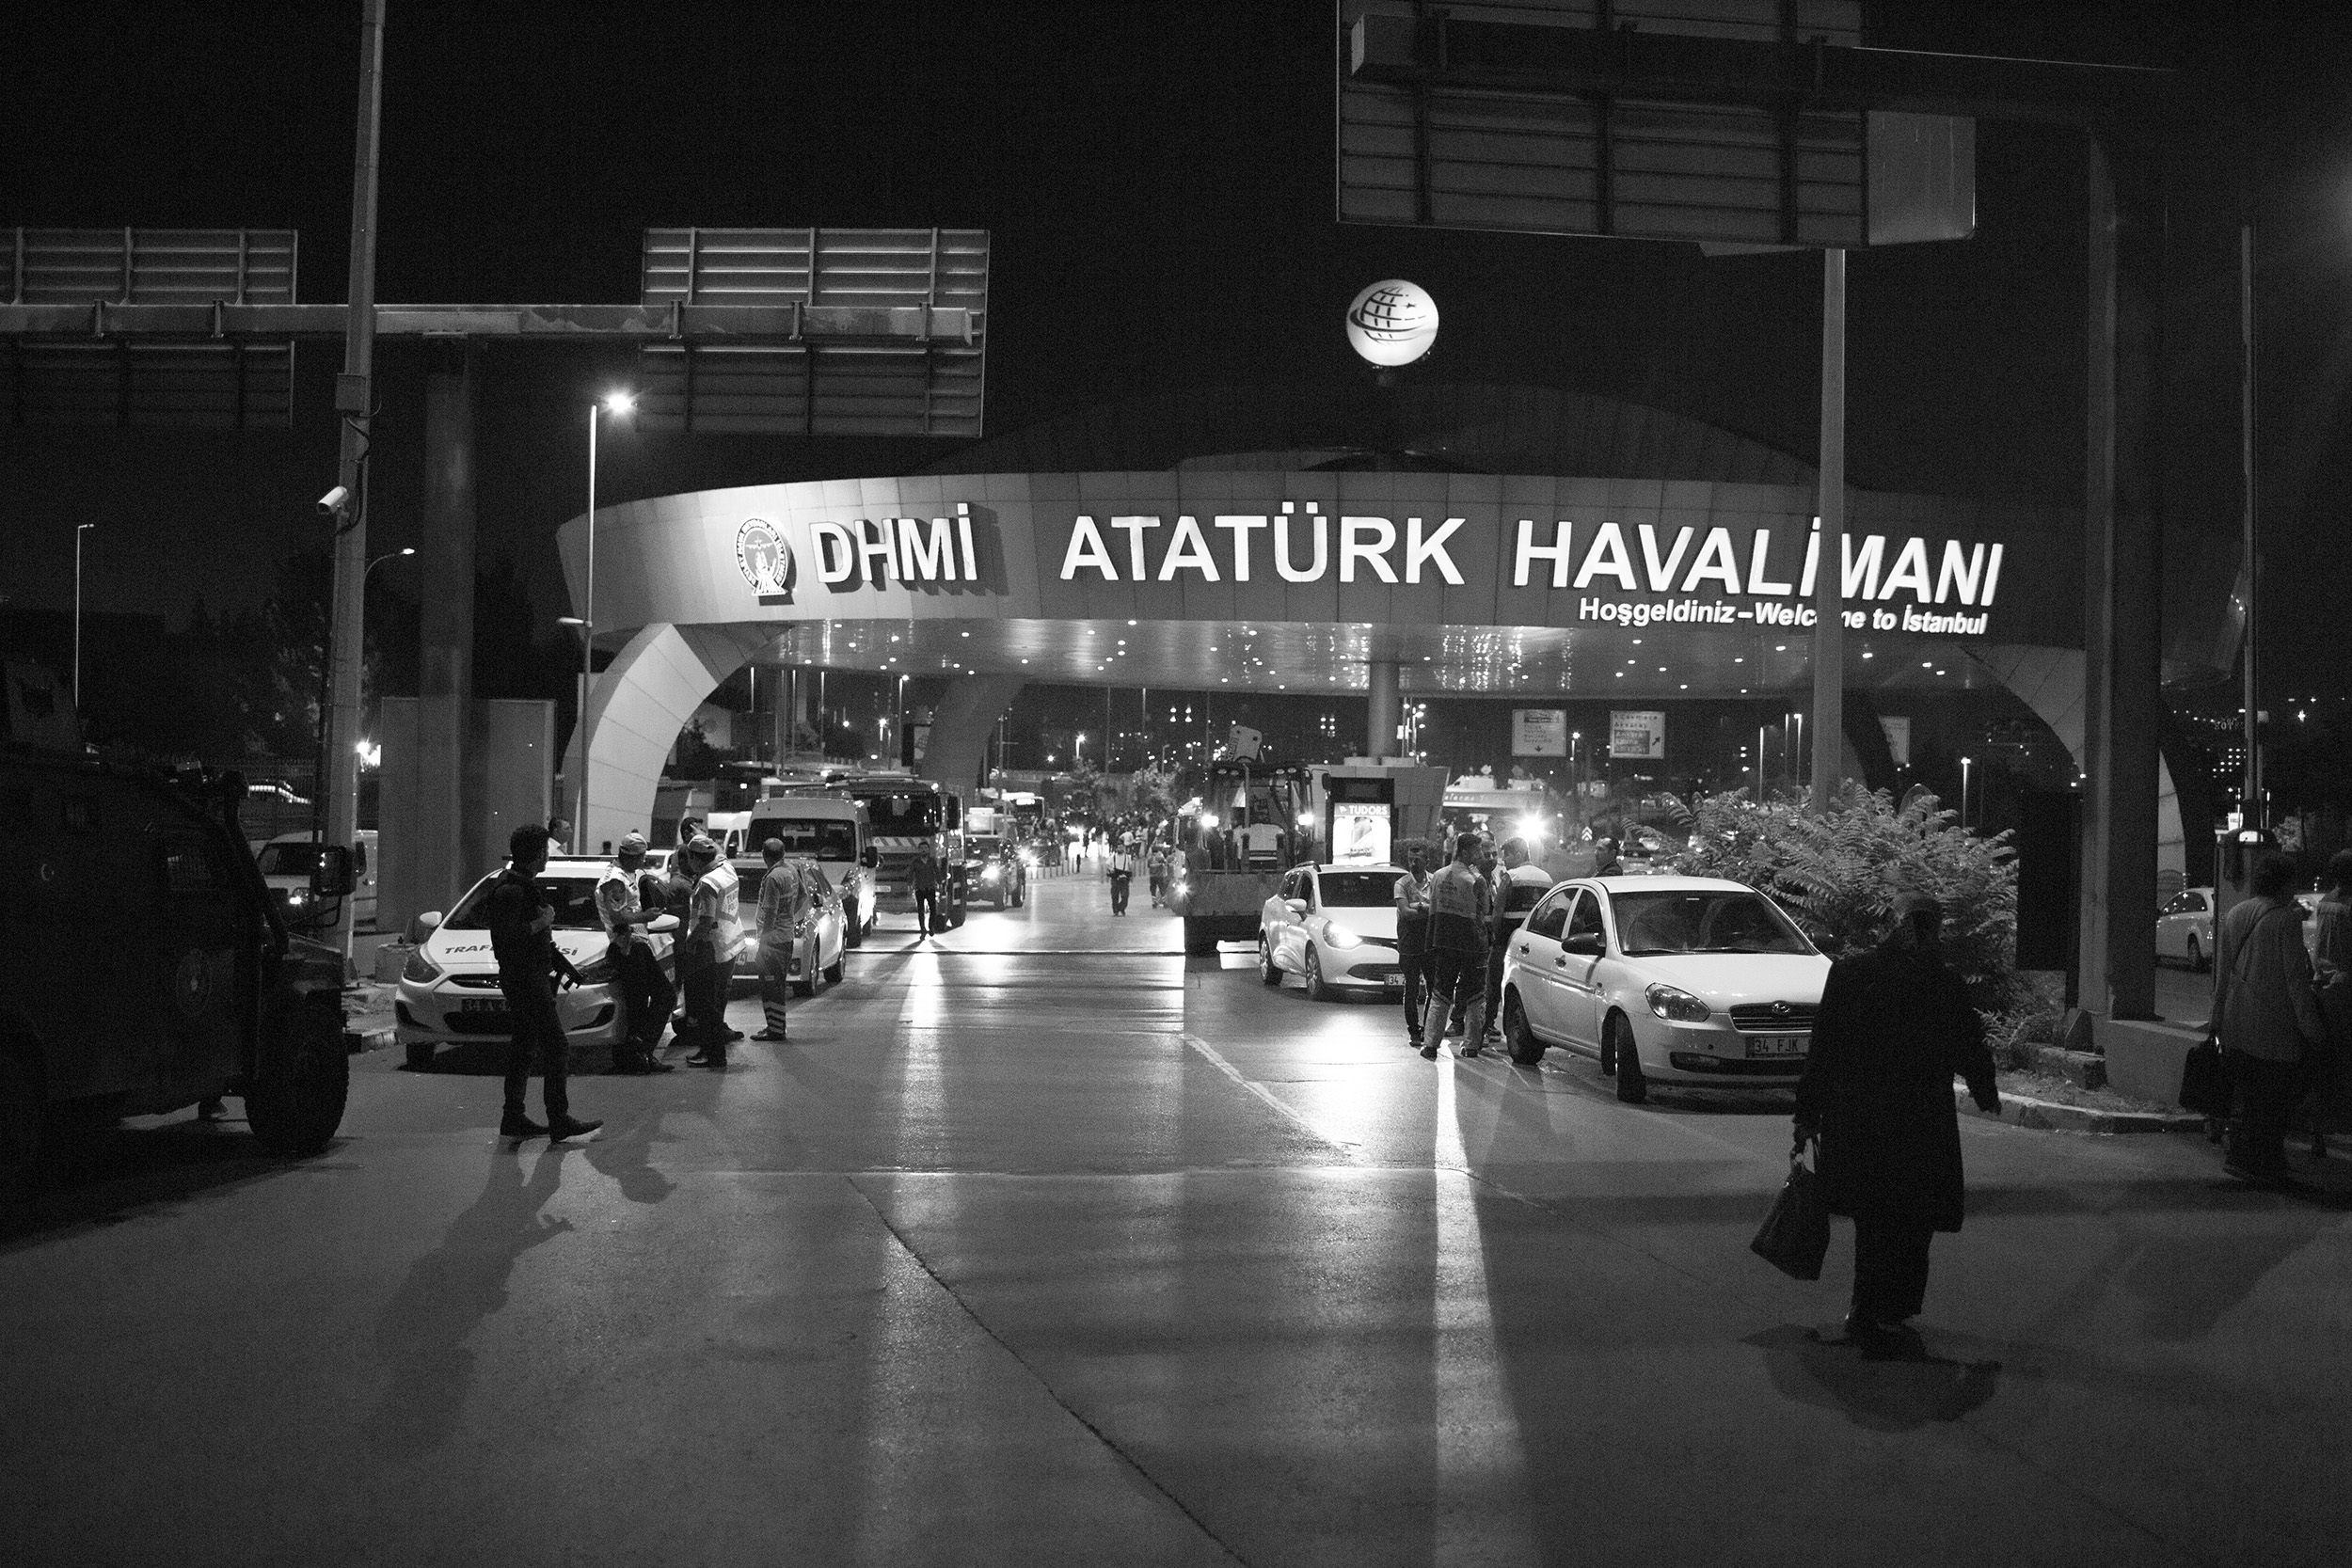 Istanbul, Attatürk, le 28 juin 2016. Attentats au terminal international. Photo : Marc Roussel